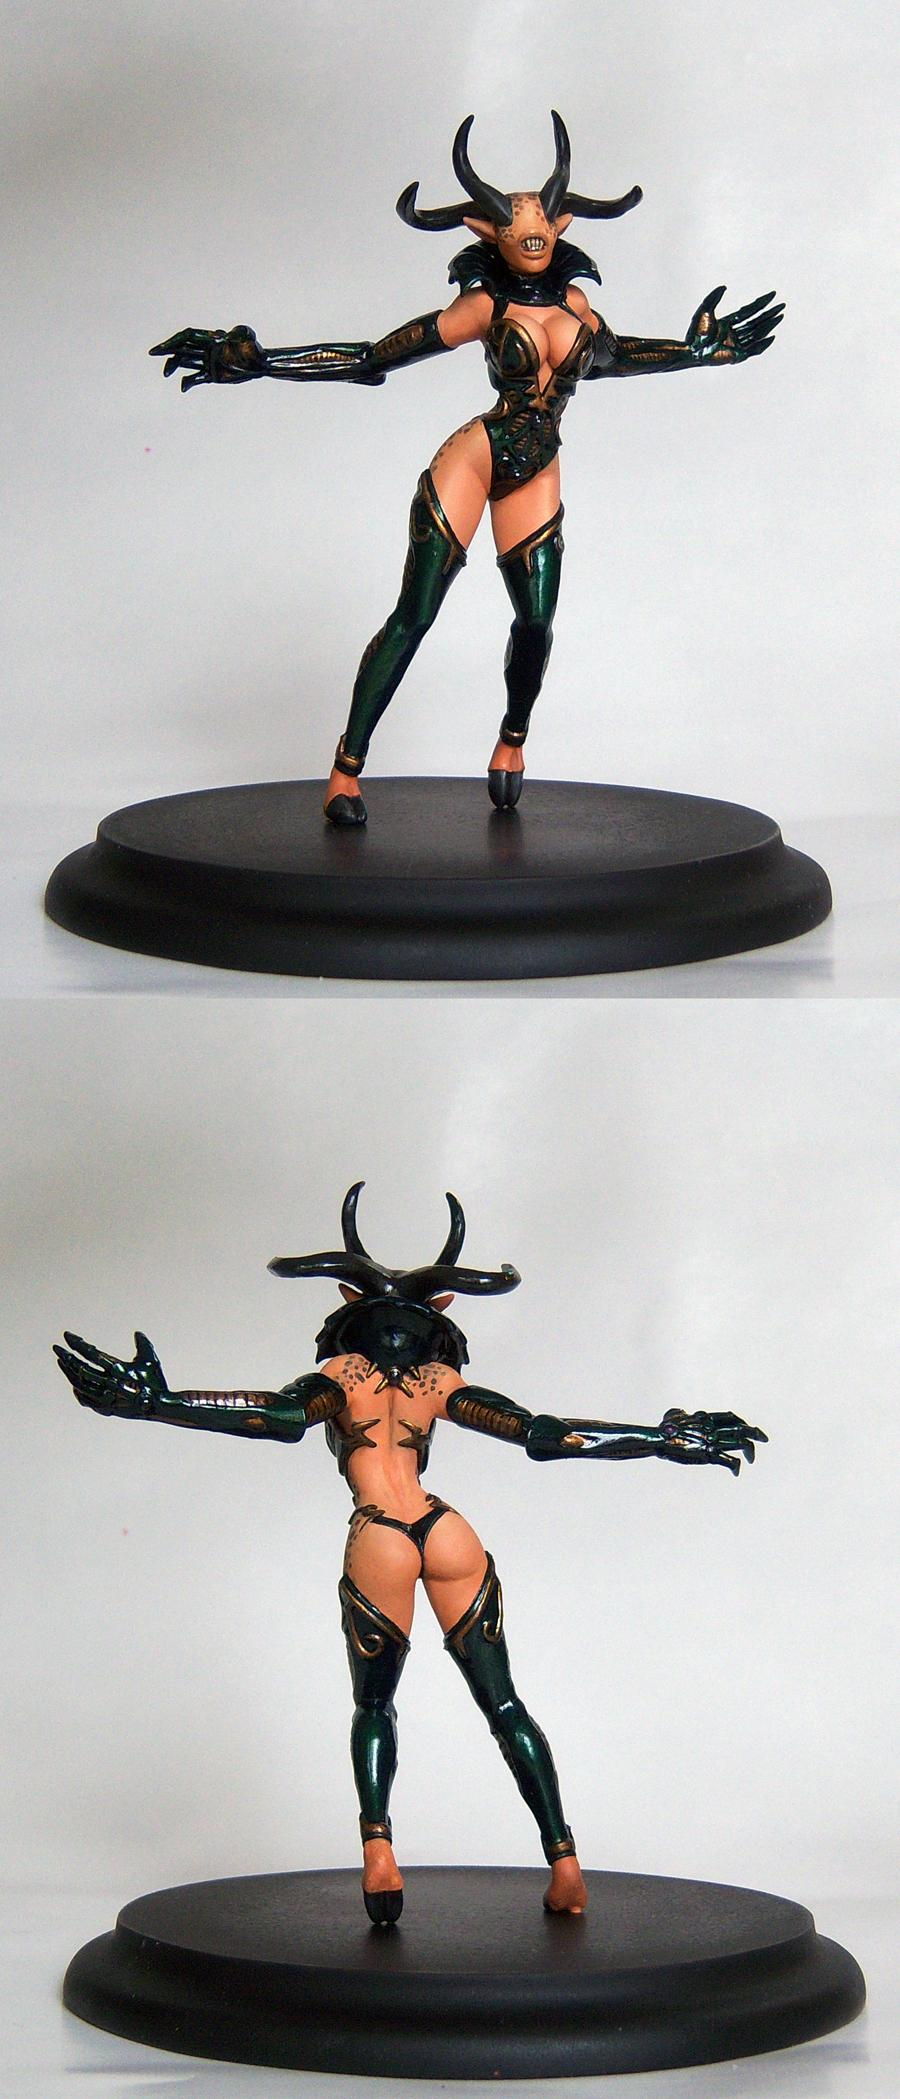 Chaos, Daemons, Keeper Of Secrets, Sculpting, Slaanesh, Slaanesh Chaos Keeper Of Secrets Daemon